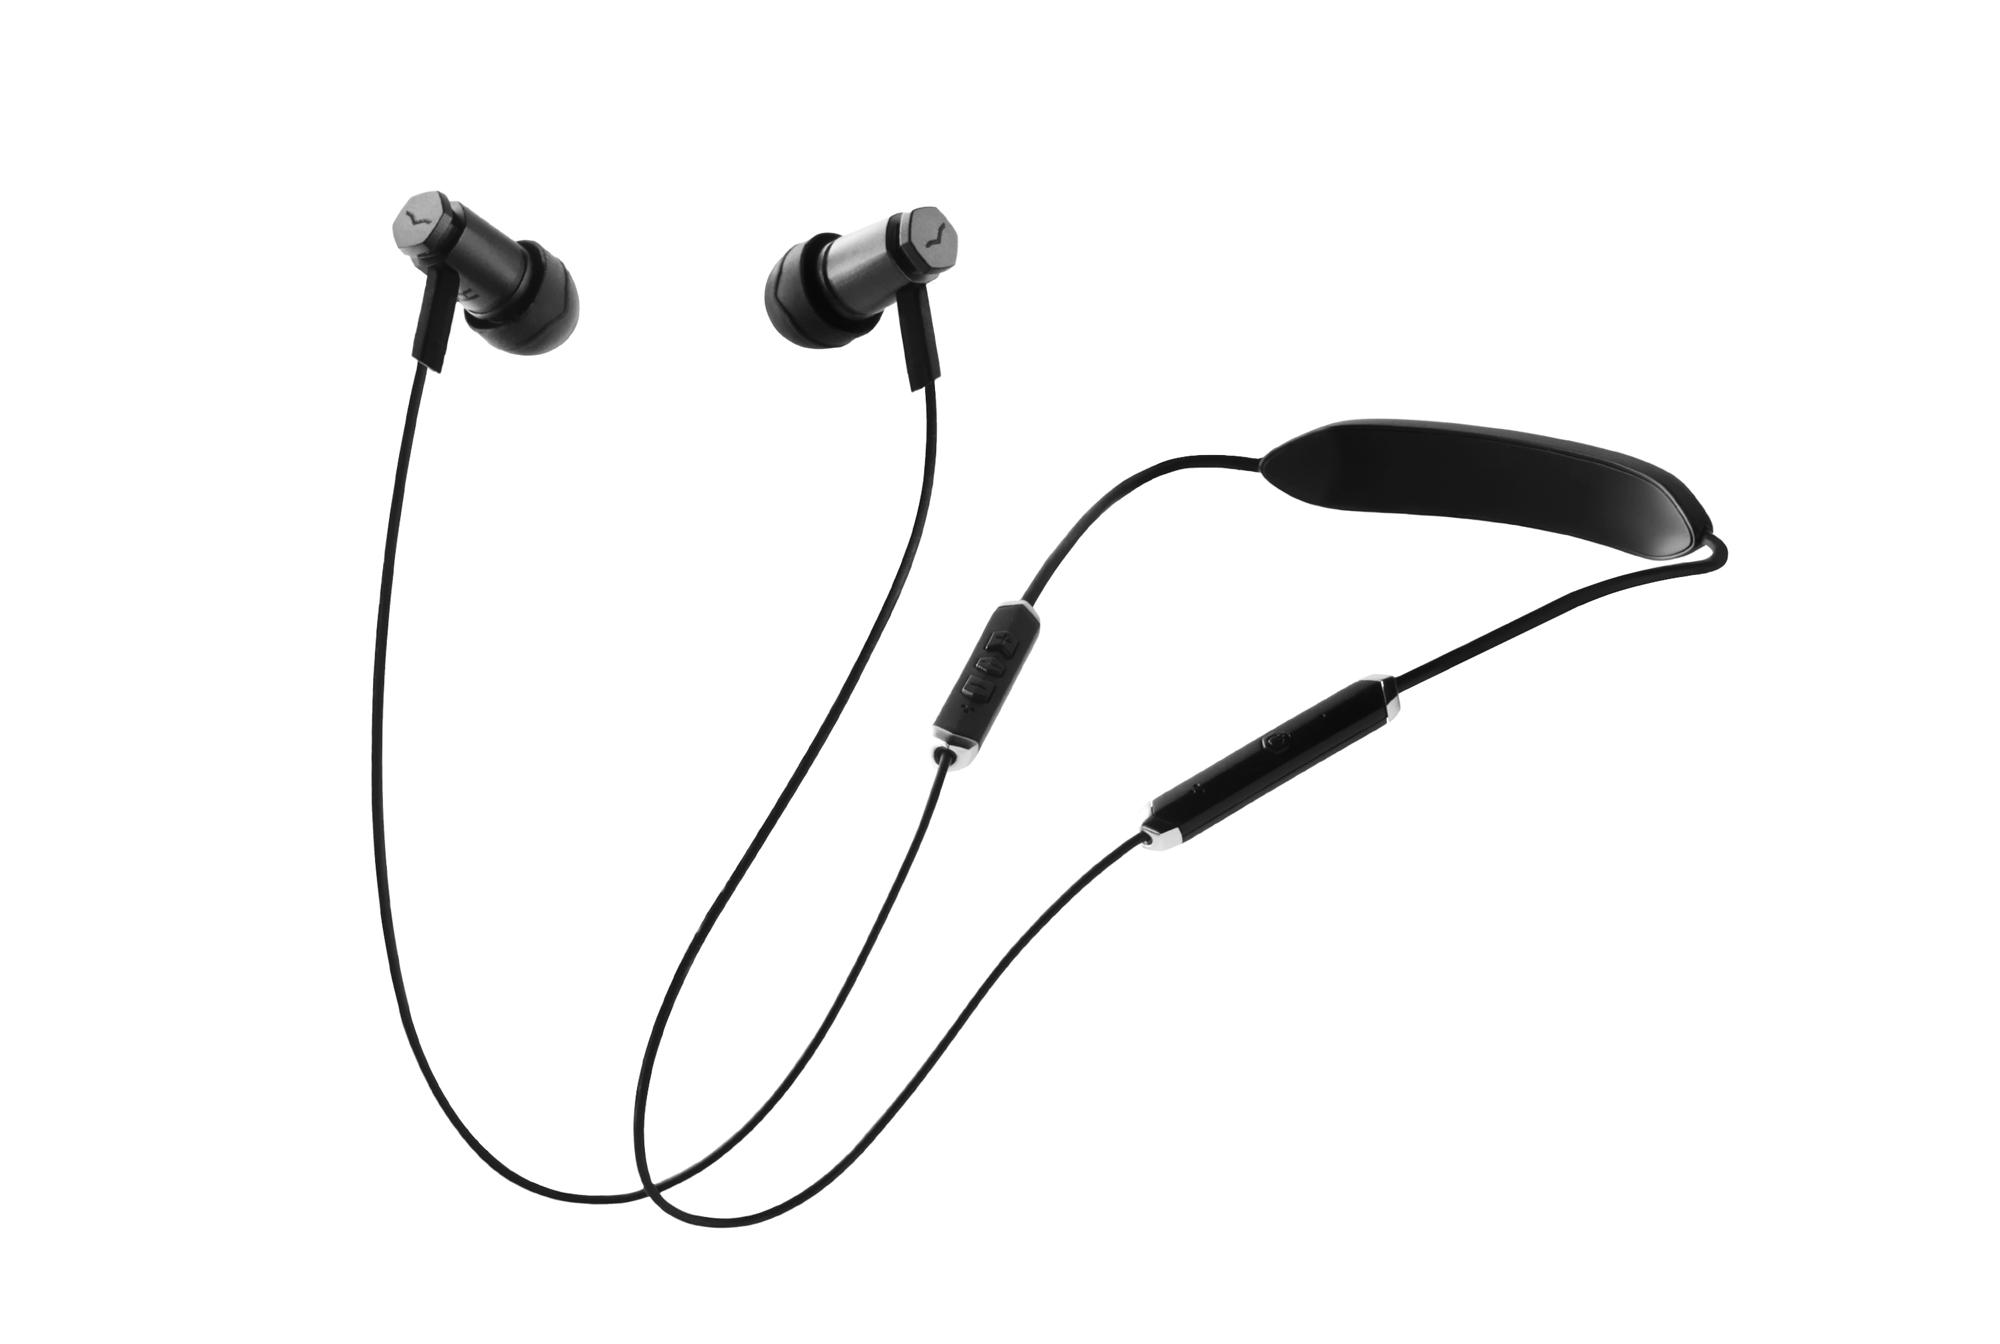 V Moda Introduces New Forza Metallo Wireless Earbuds